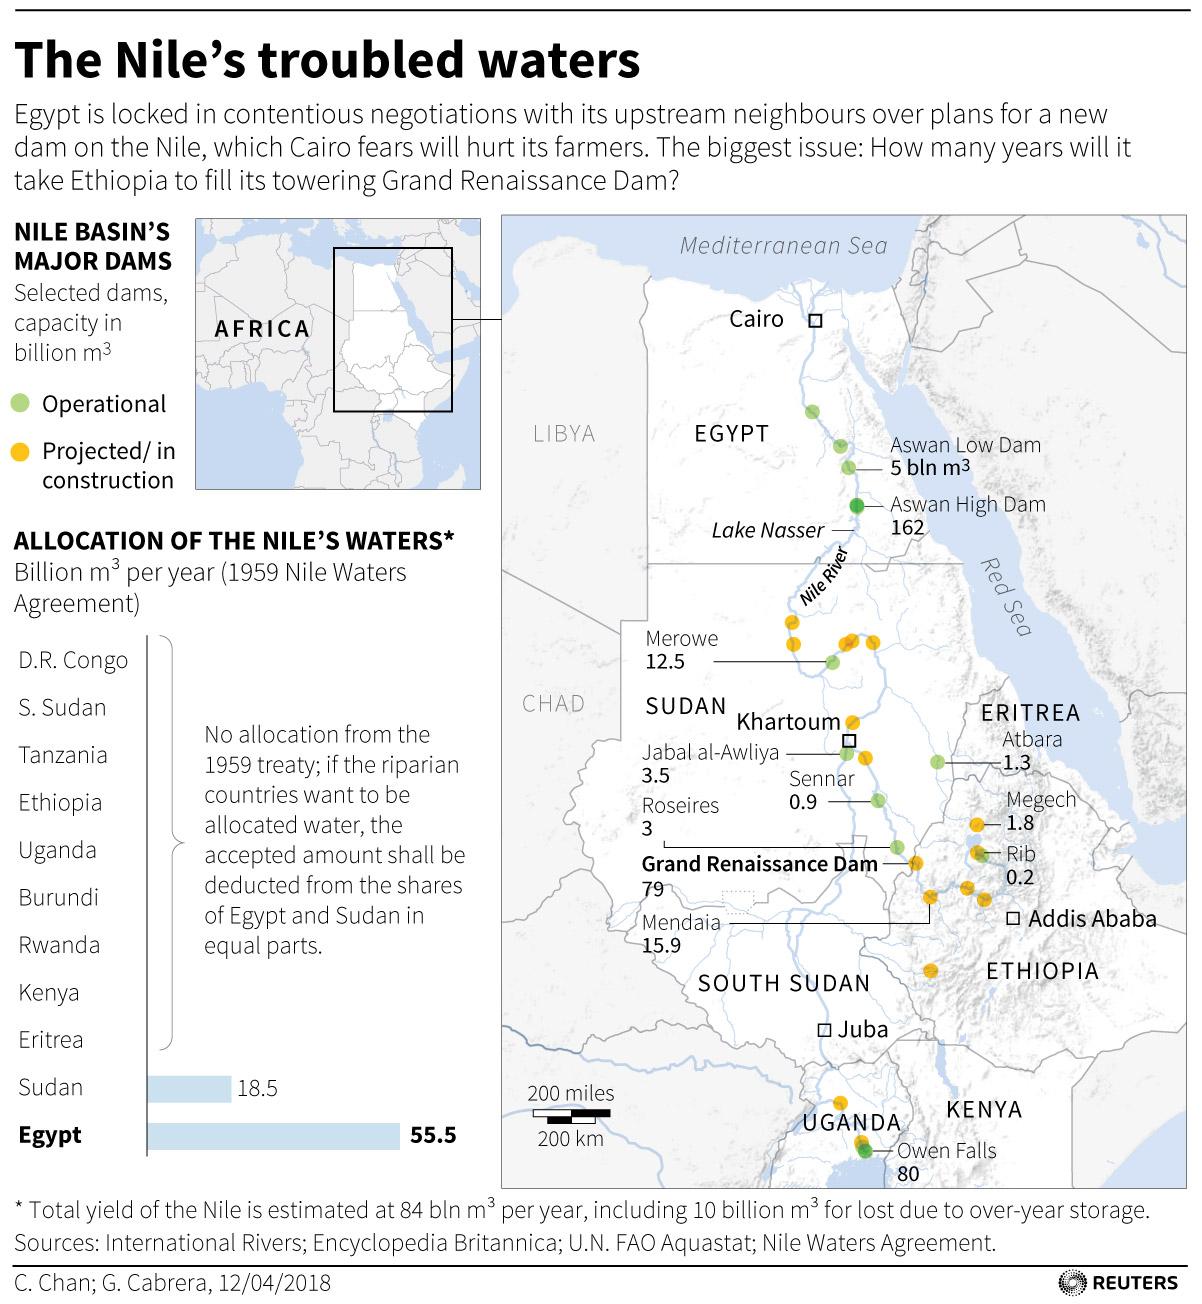 AFRICA-2017: Grand Ethiopian Renaissance Dam on NILE remains